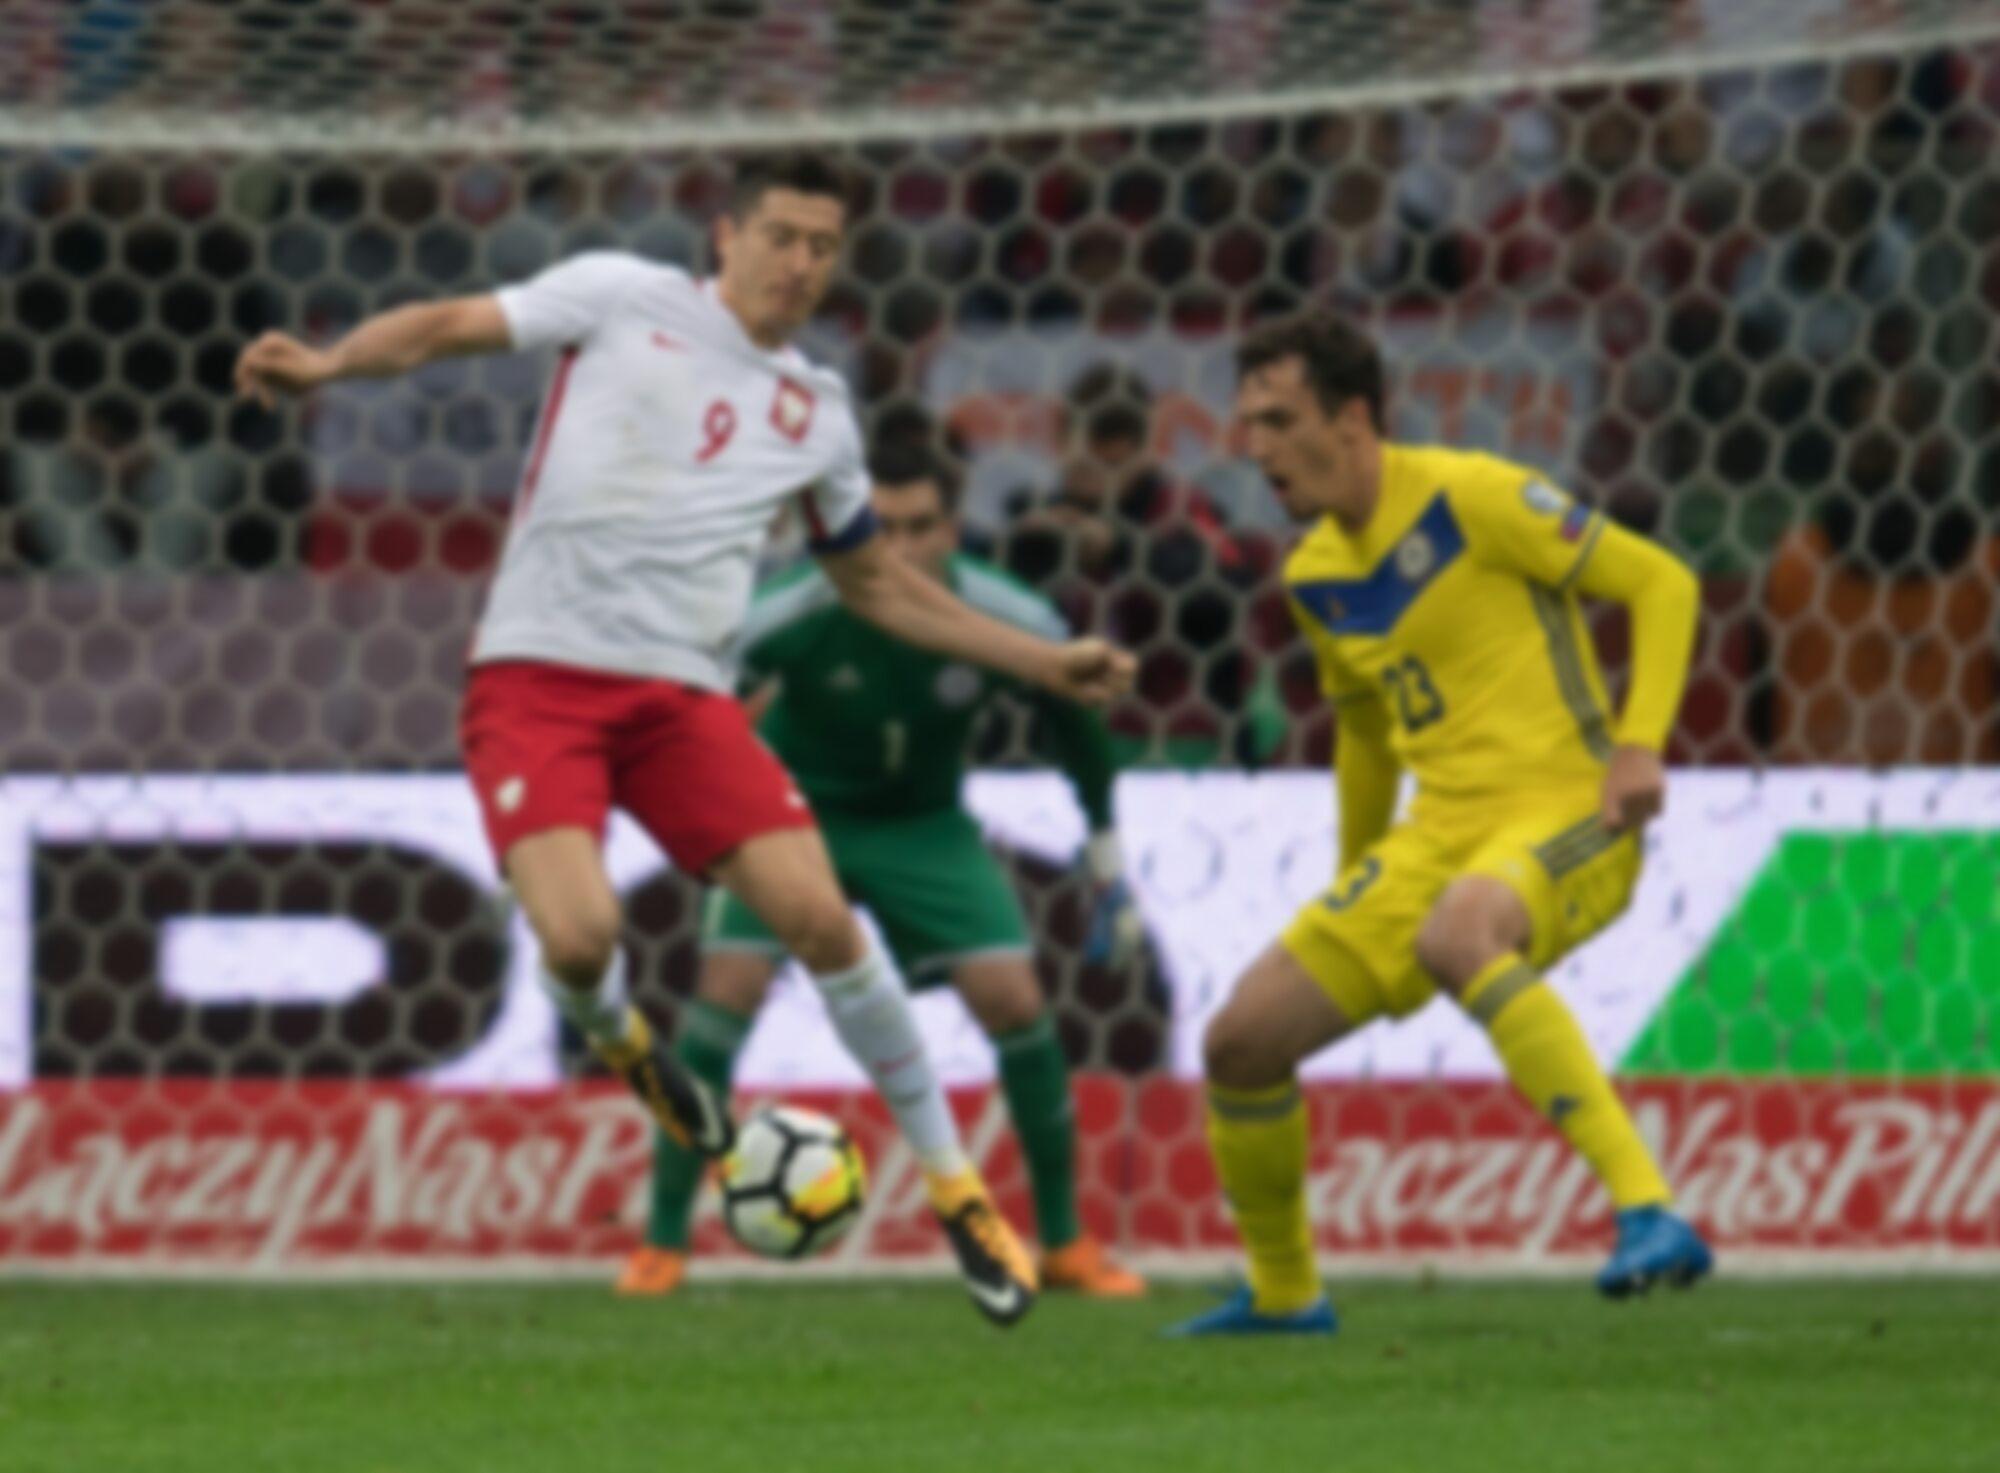 Mecz Polska - Kazachstan